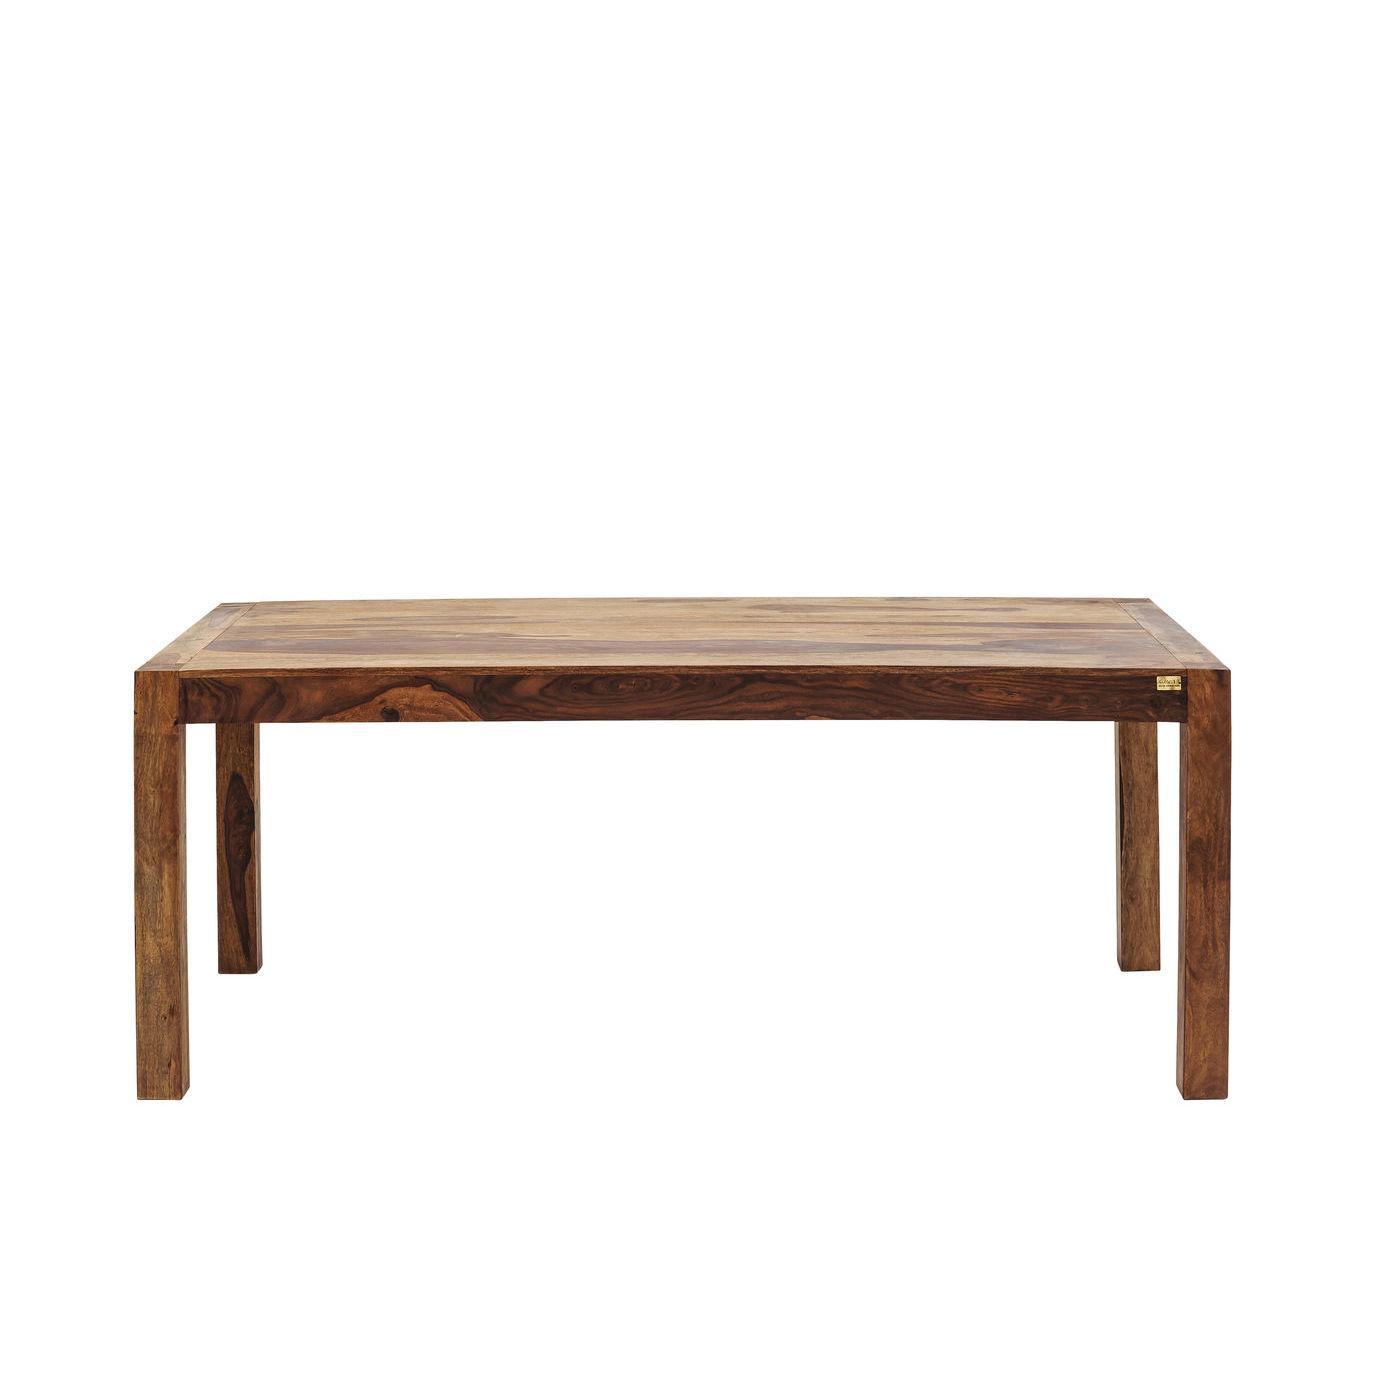 KARE DESIGN Authentico spisebord - natur sheeshamtræ (160x80)